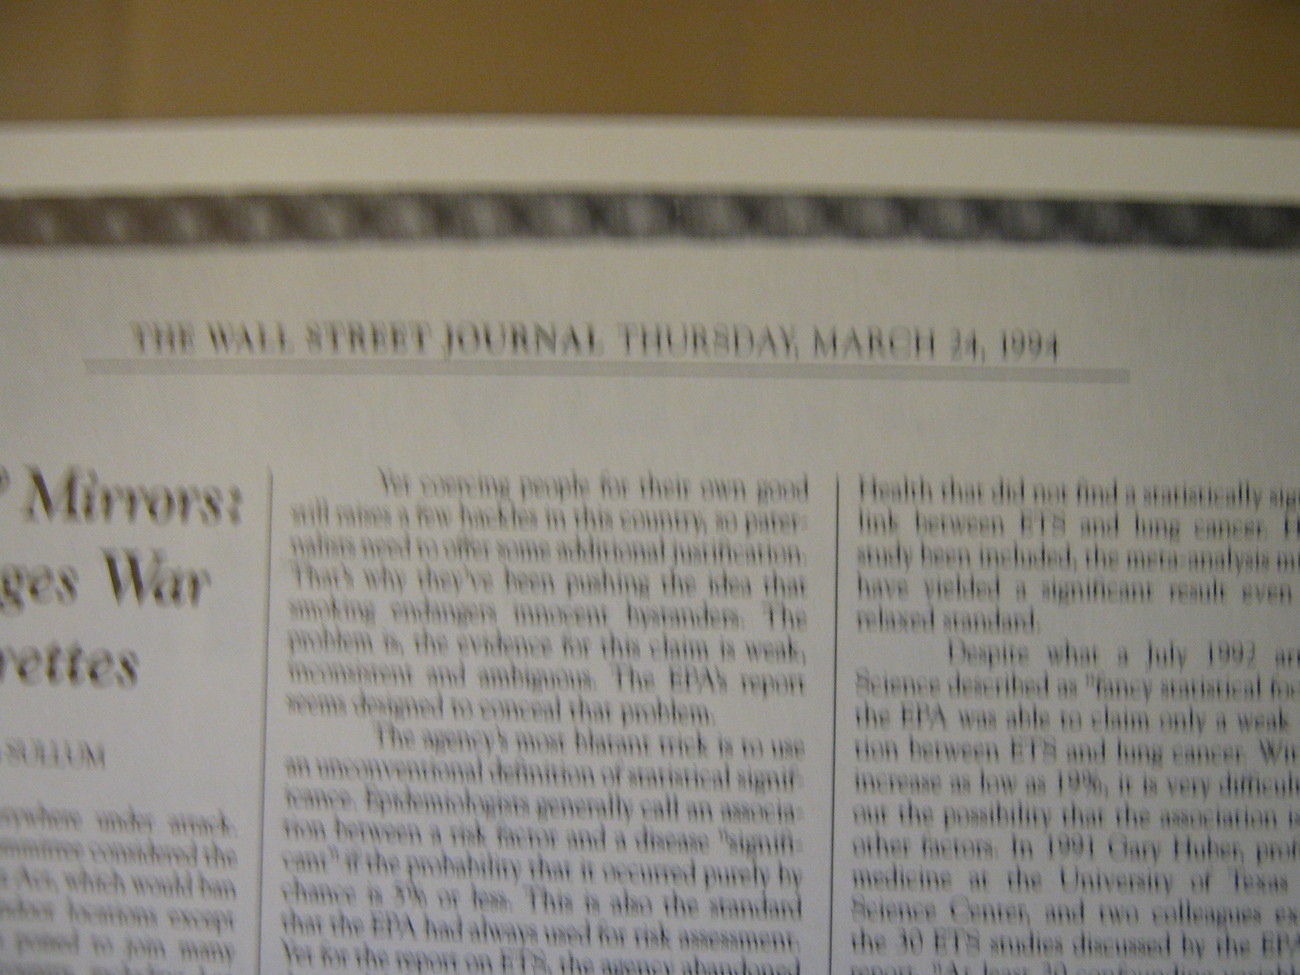 JOE CAMEL Cigarette ,  Insider Magazine , 1993  , Wall Street Journal Article  3